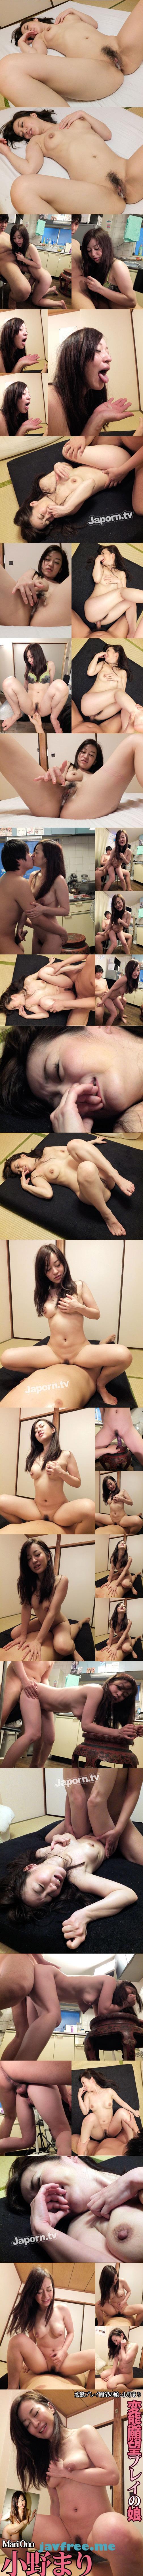 [DSAM-32] 変態プレイ願望の娘 : 小野まり - image DSAM-32b on https://javfree.me